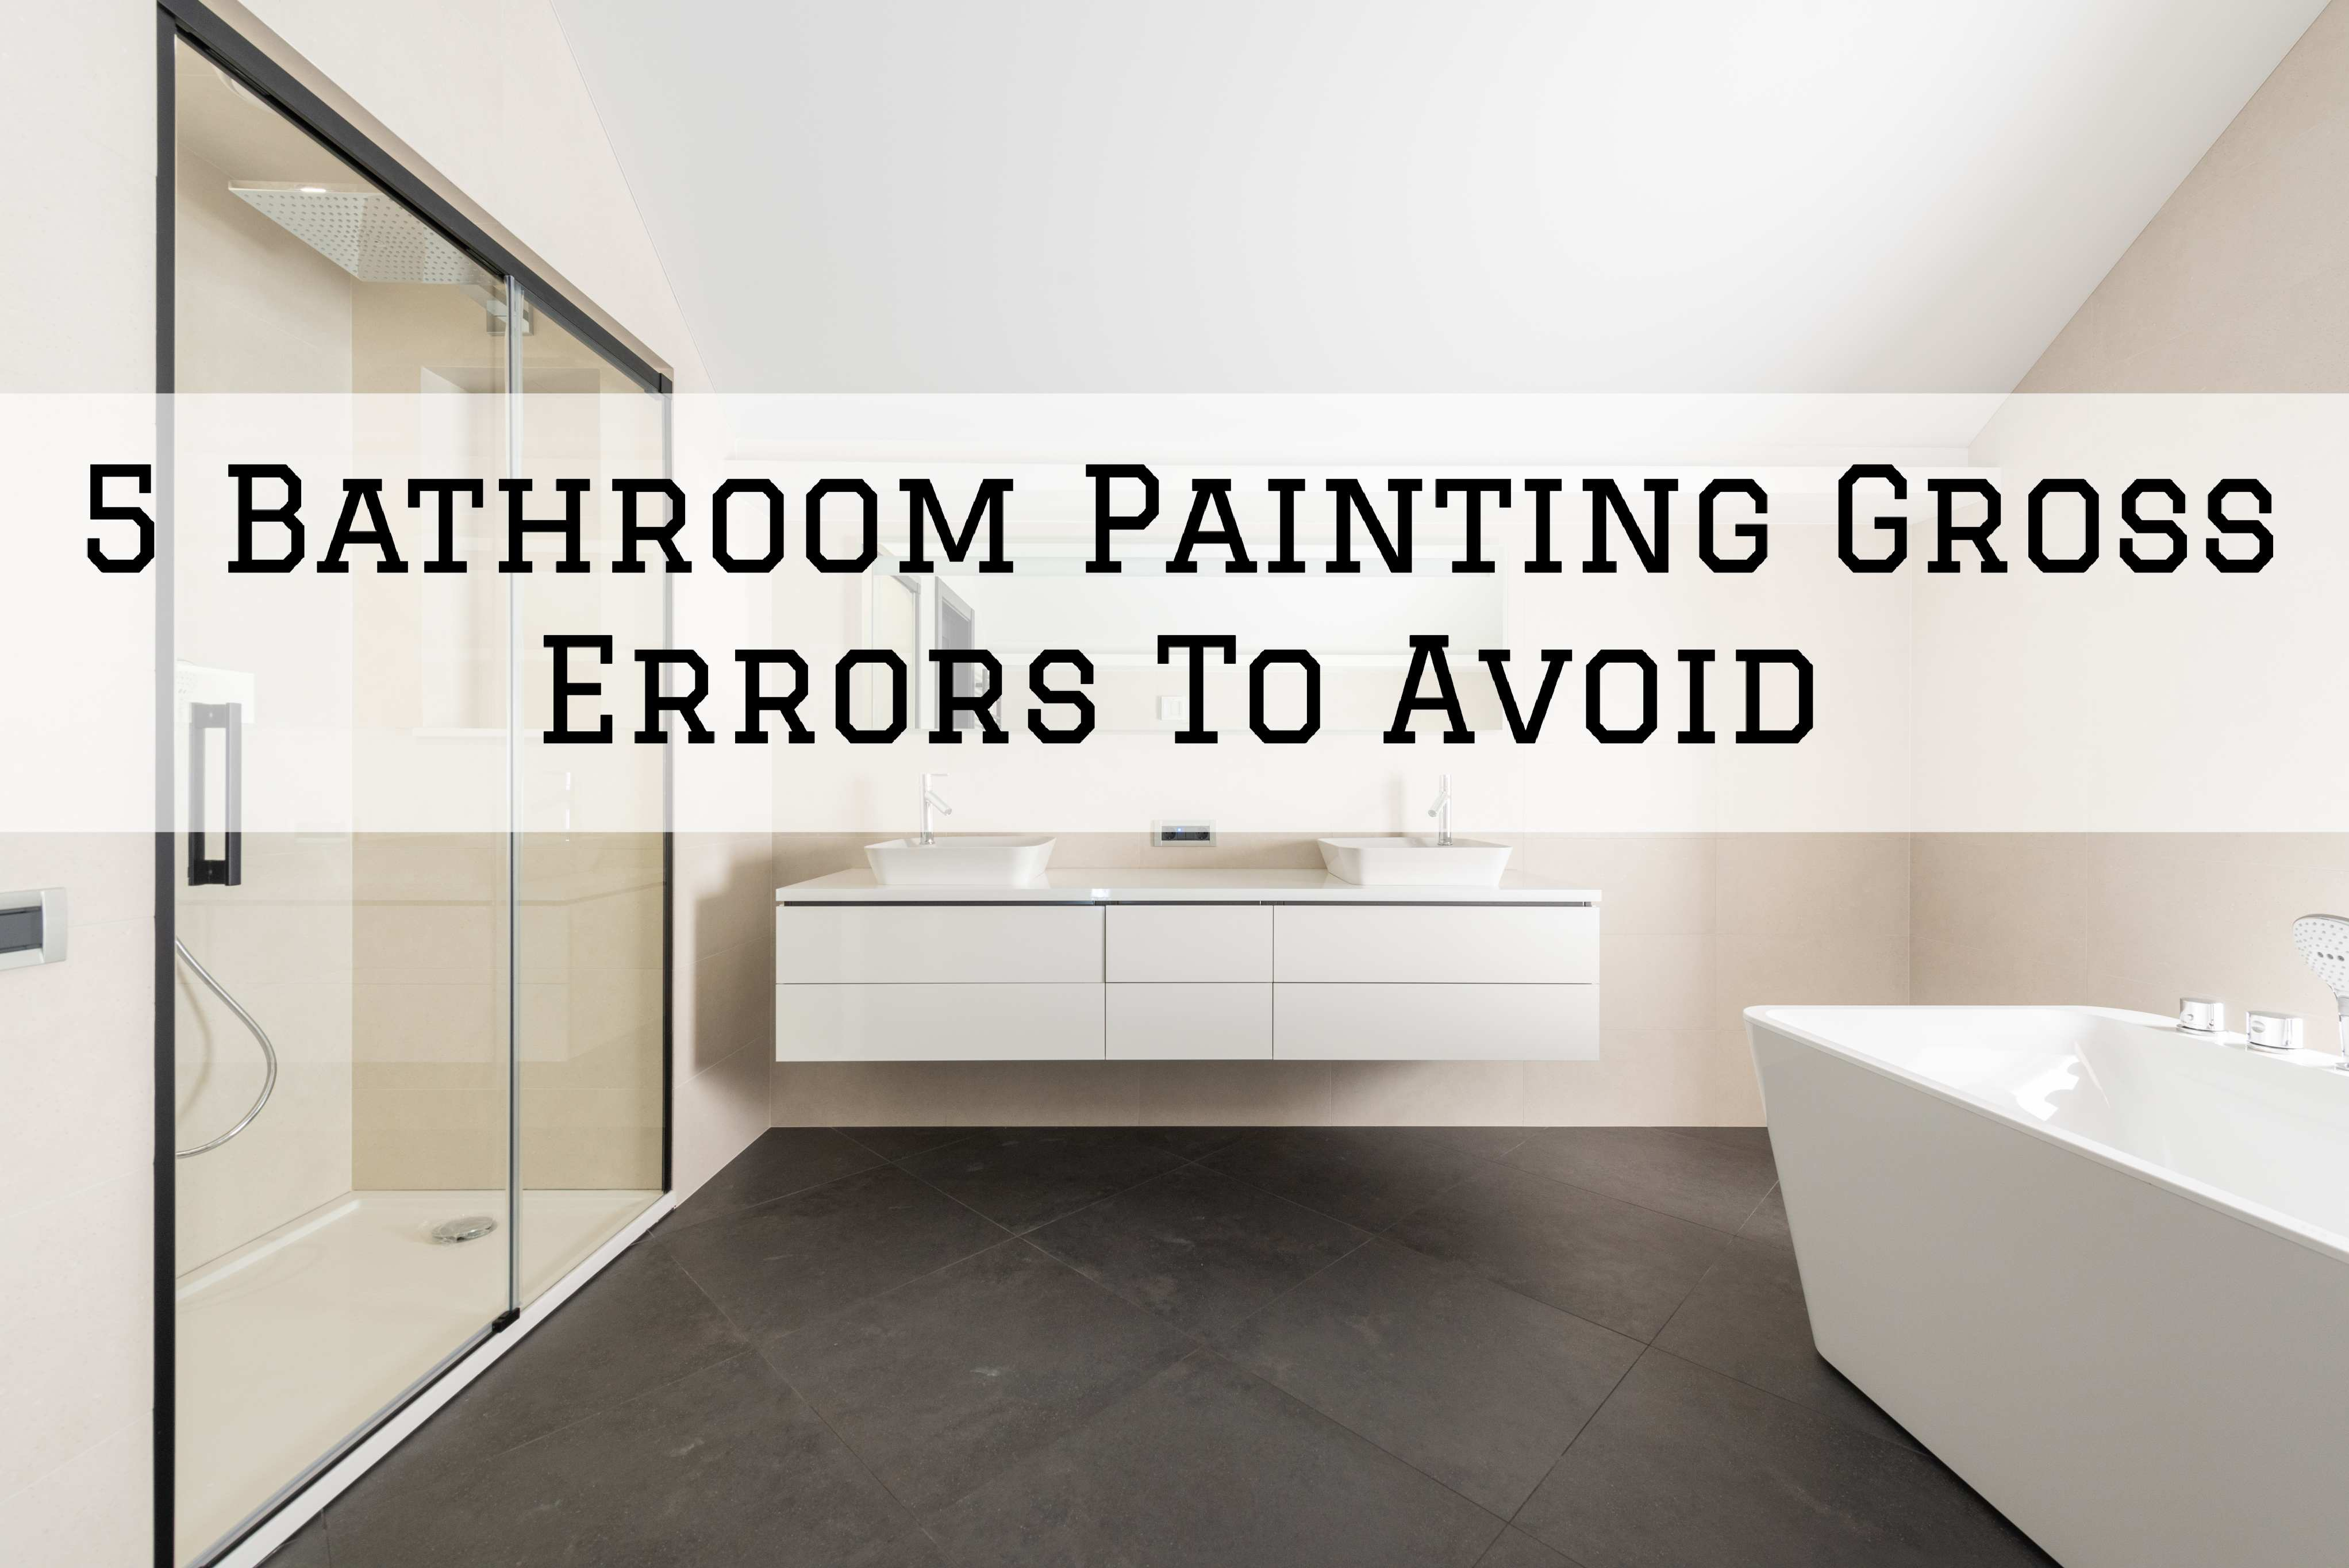 2021-10-02 Selah Painting St Louis MO Bathroom Errors